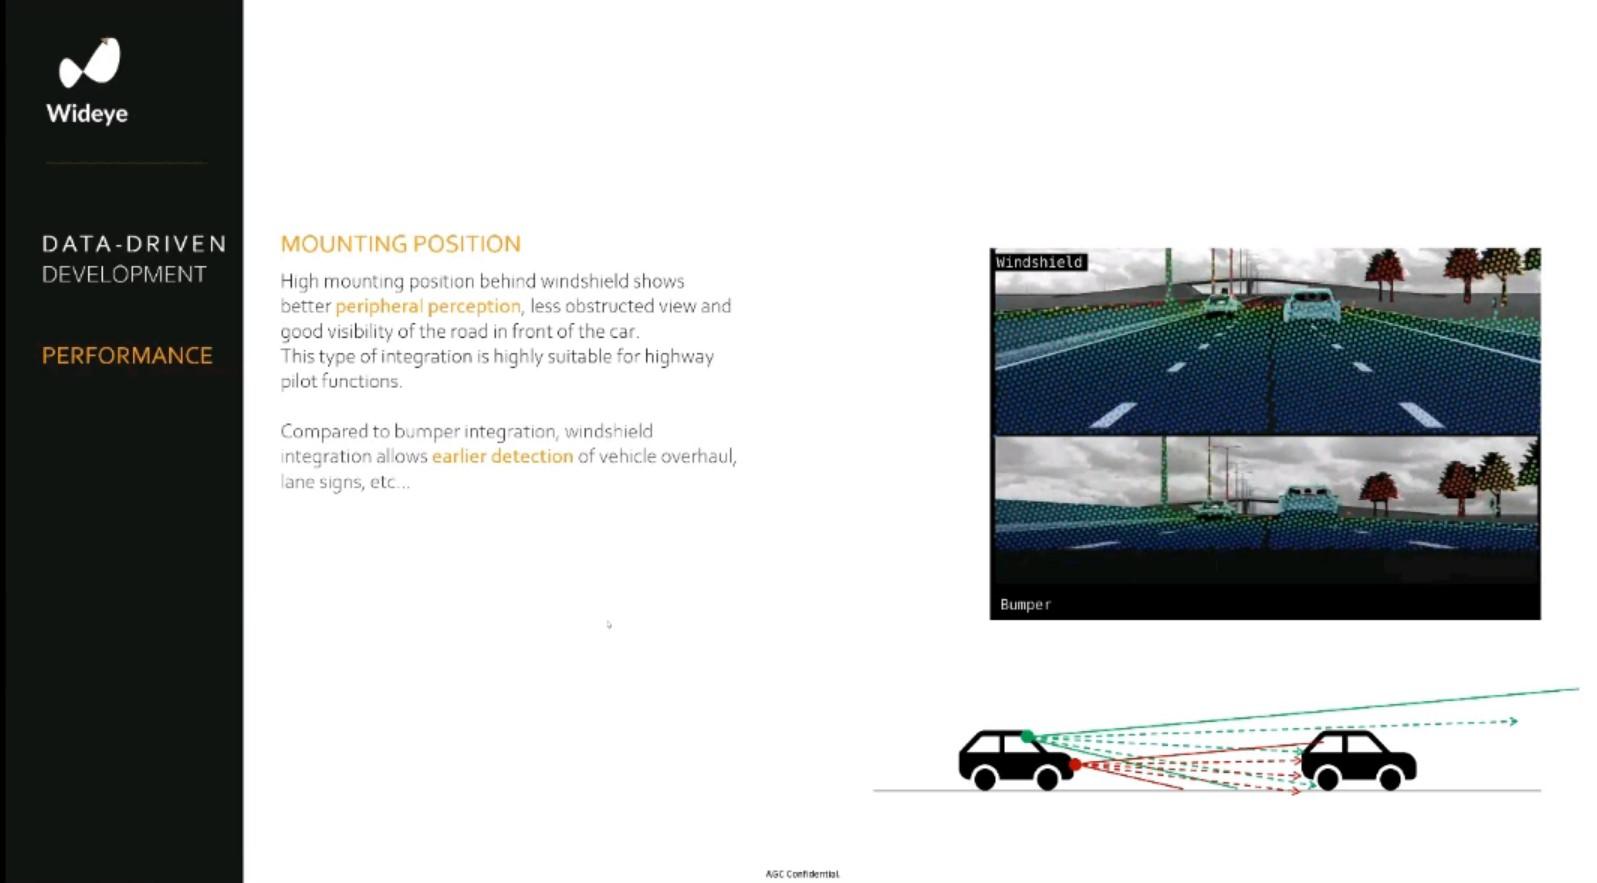 Glass as an enabler to automotive market success for LiDAR sensors